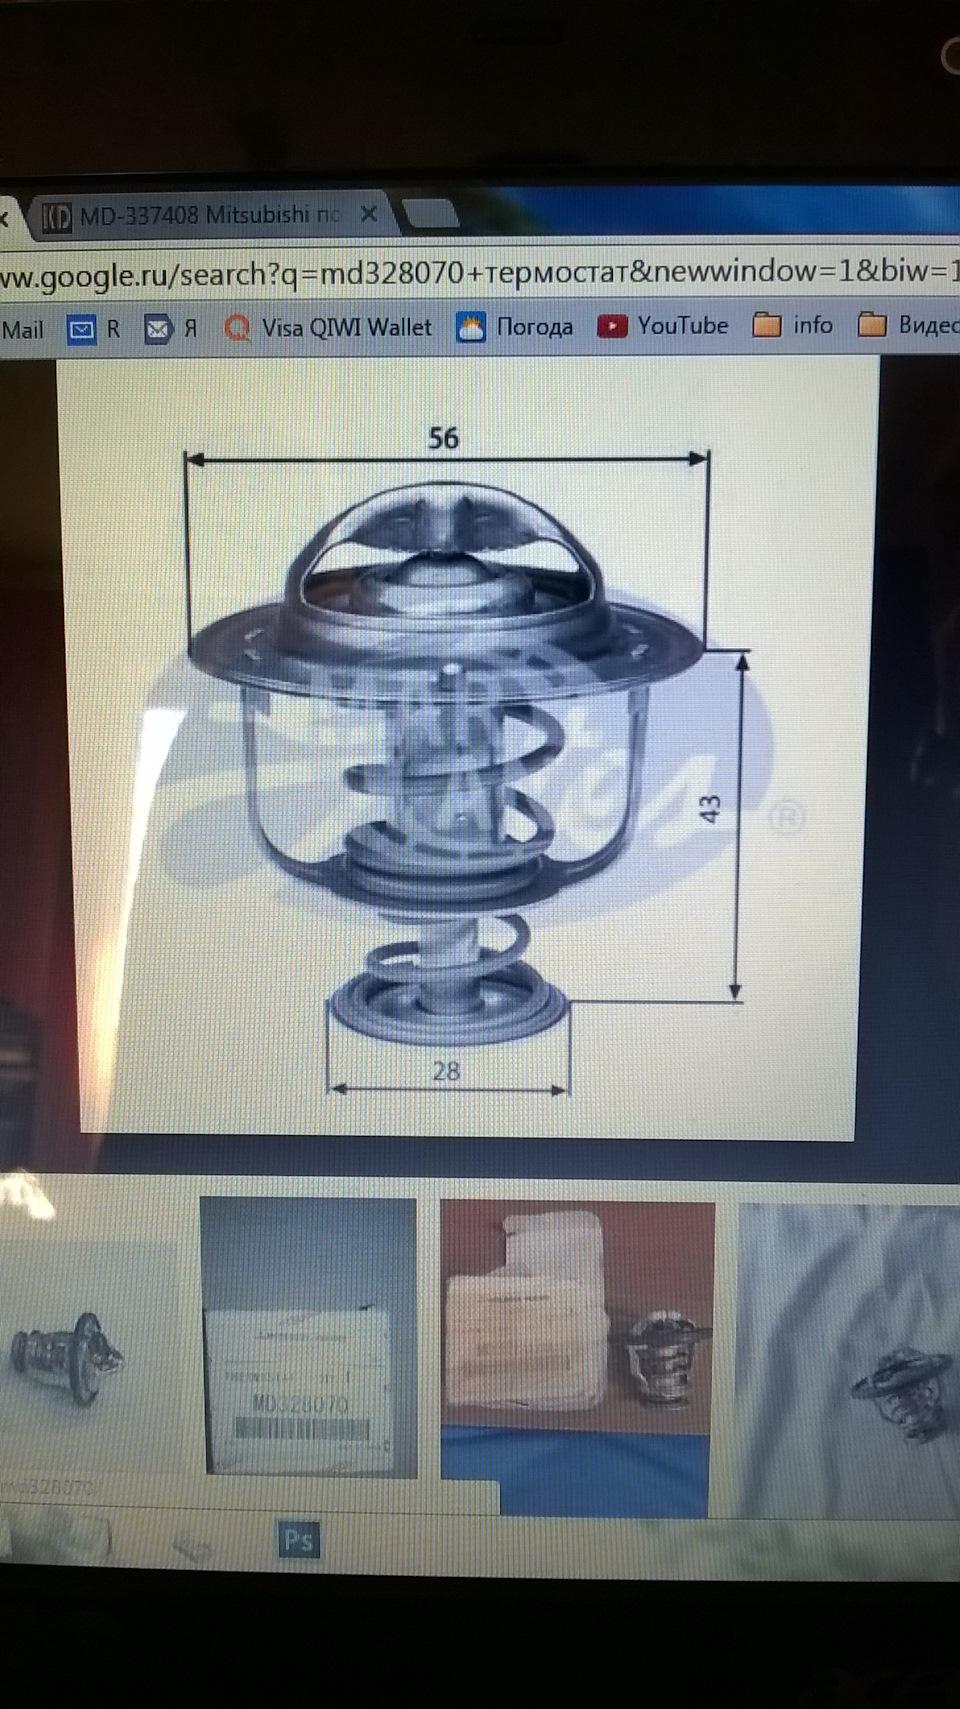 43bbd2es 960 - Термостат москвич 412 размеры